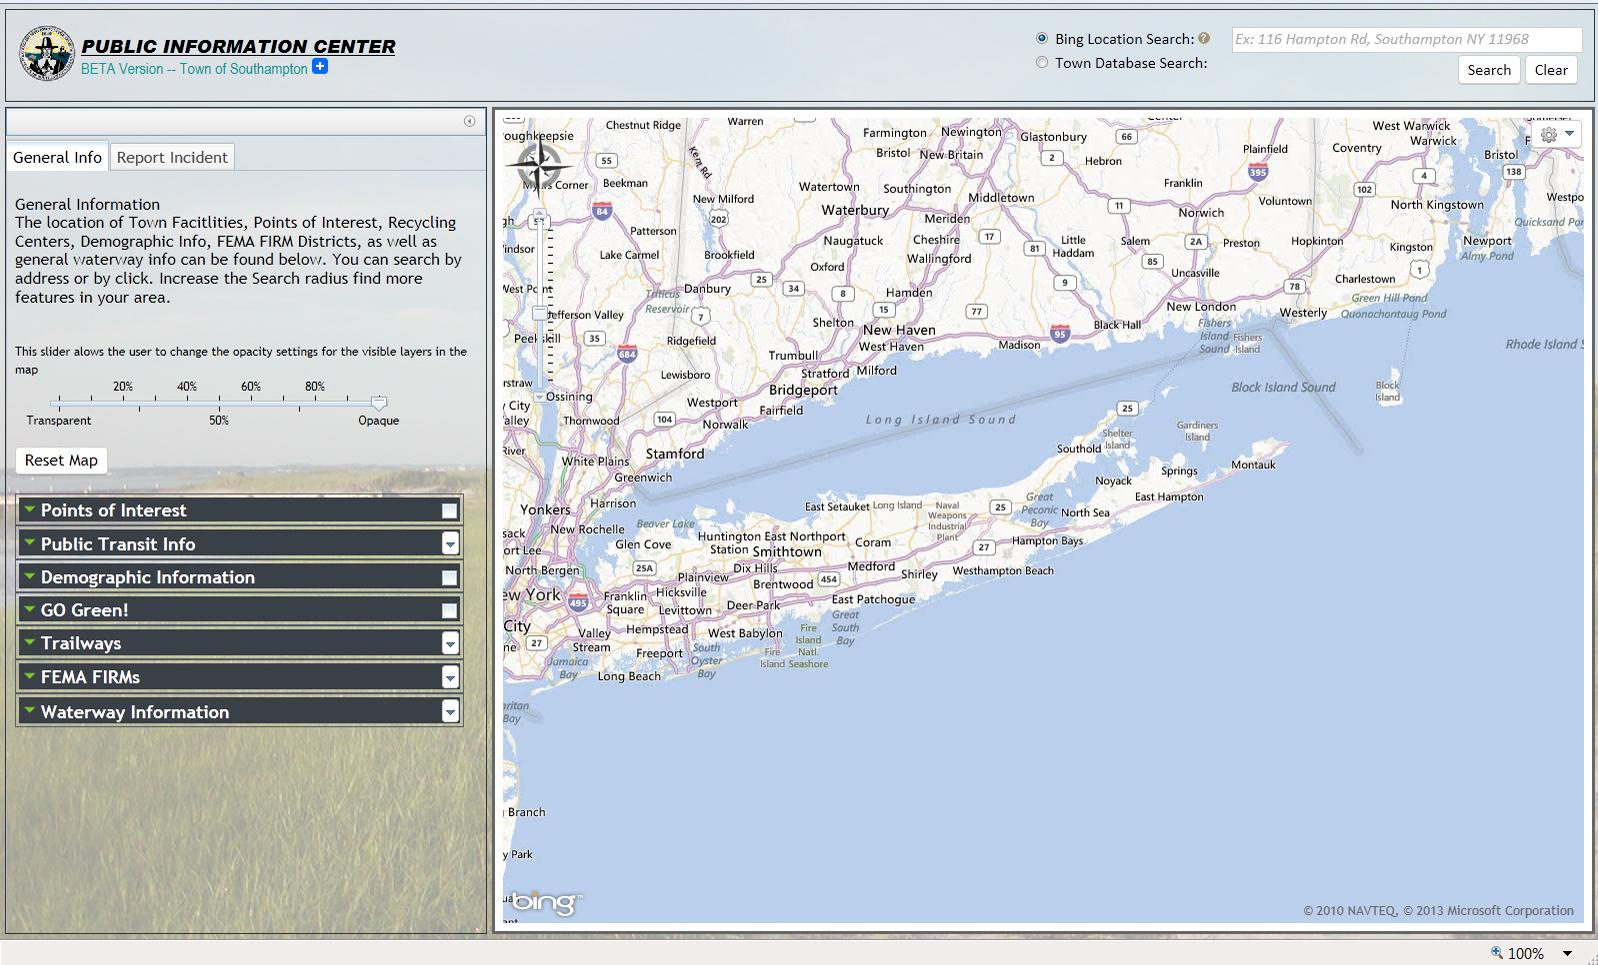 GIS Web Mapping Applications Southampton NY Official Website - Fema firm maps gis